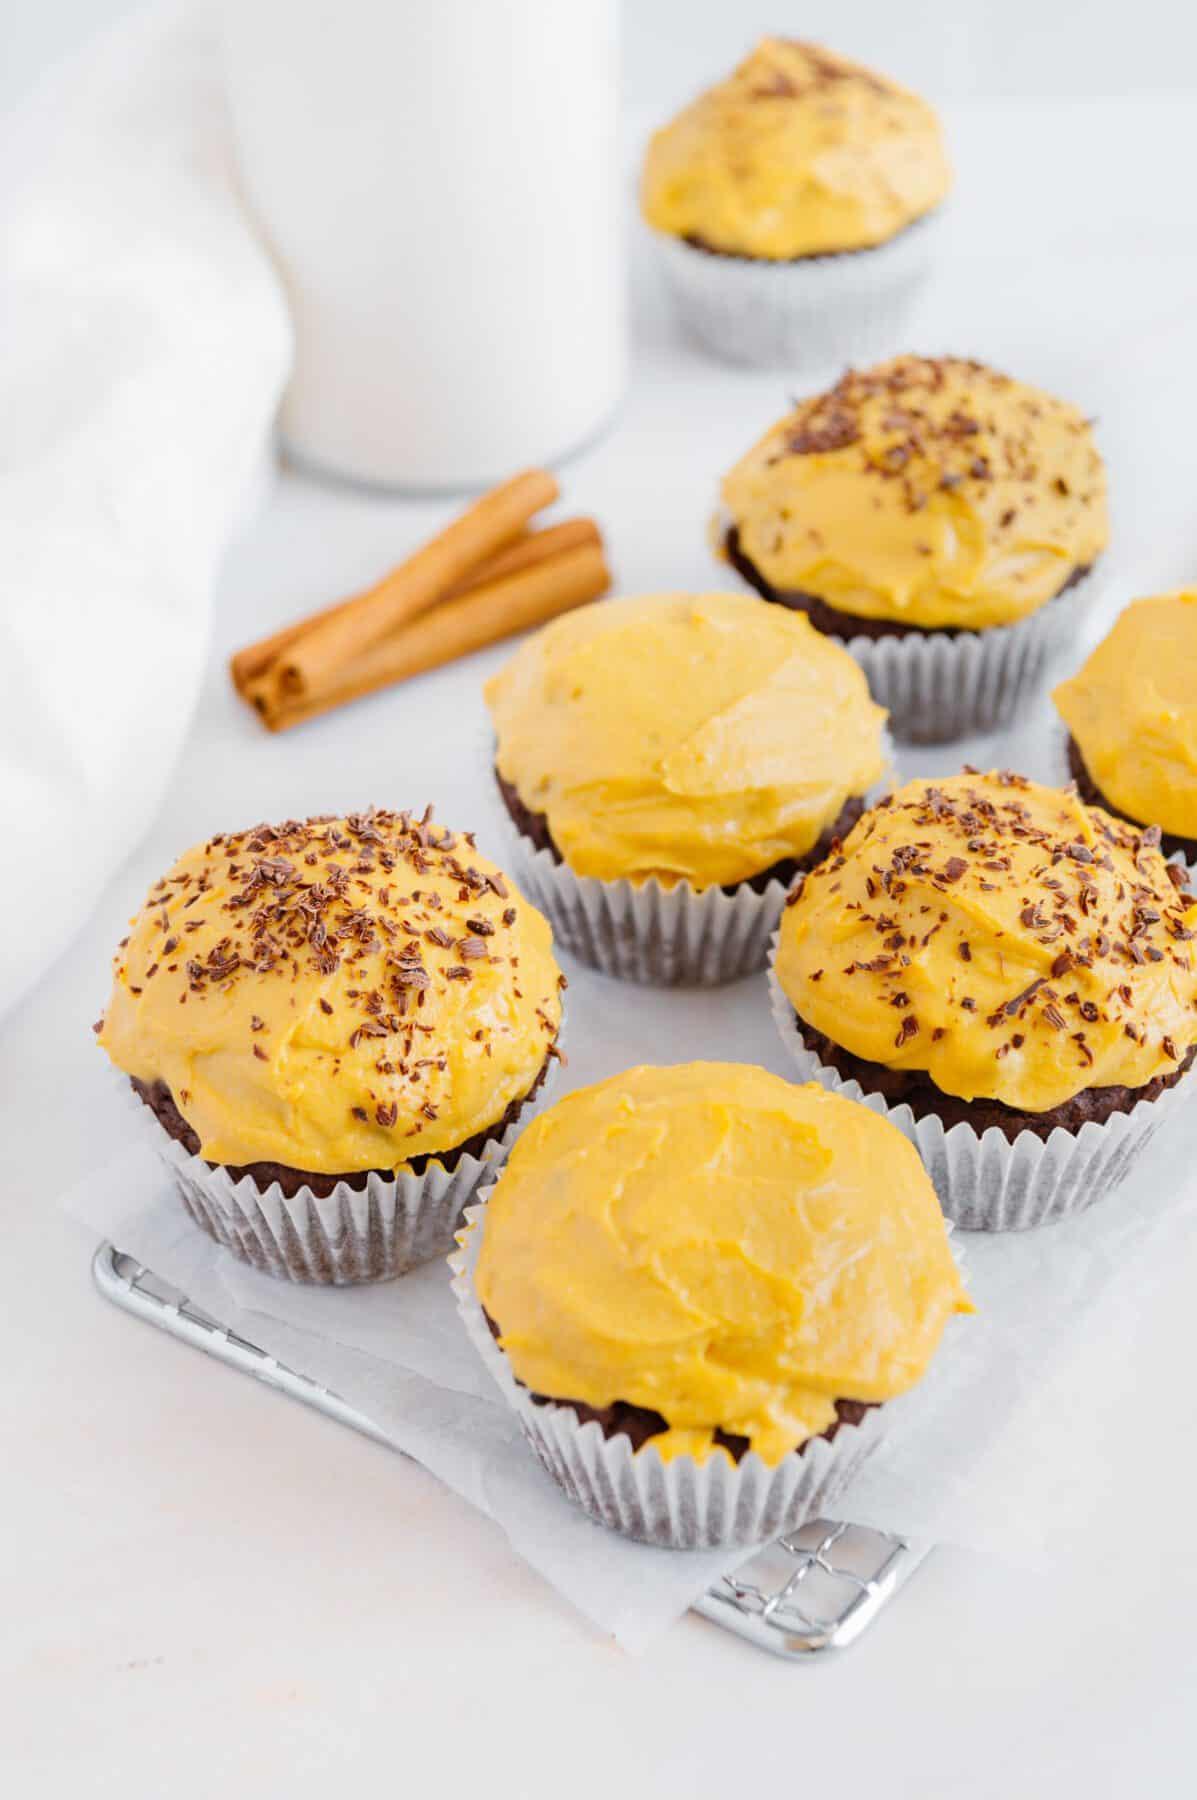 Vegan Chocolate Pumpkin Muffins with Pumpkin Cream Cheese Frosting (GF + nut-free)